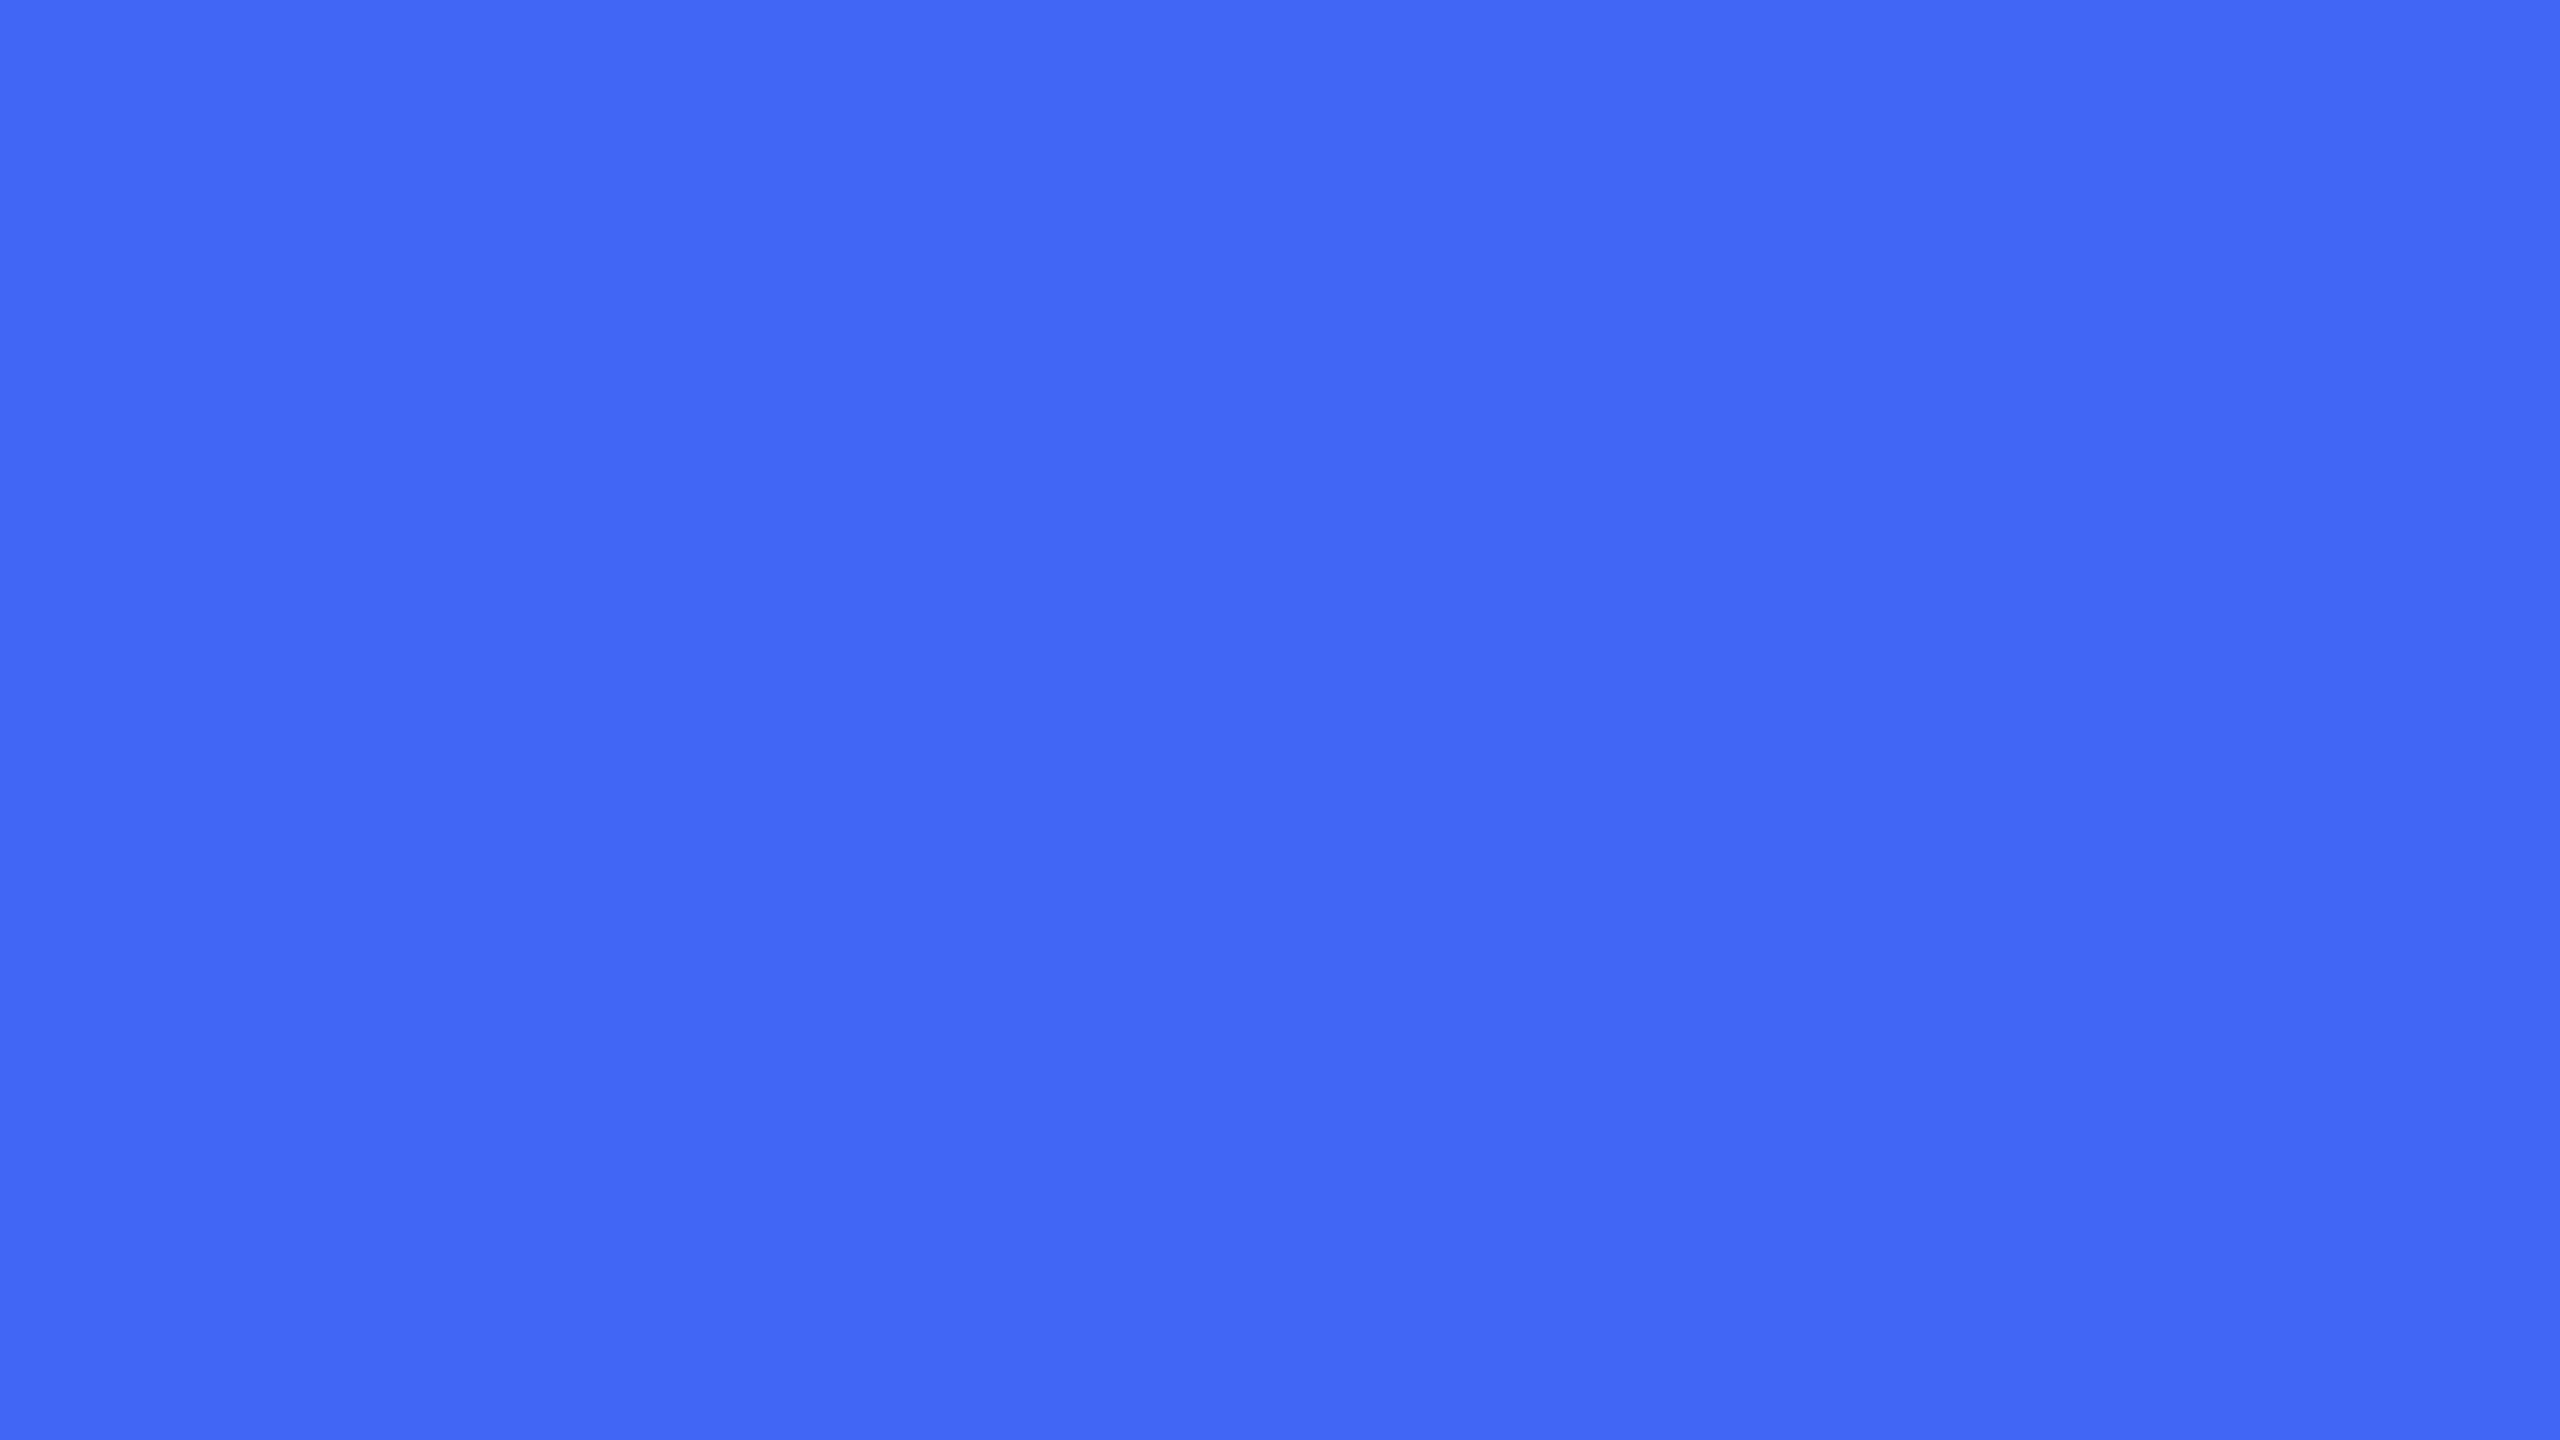 2560x1440 Ultramarine Blue Solid Color Background